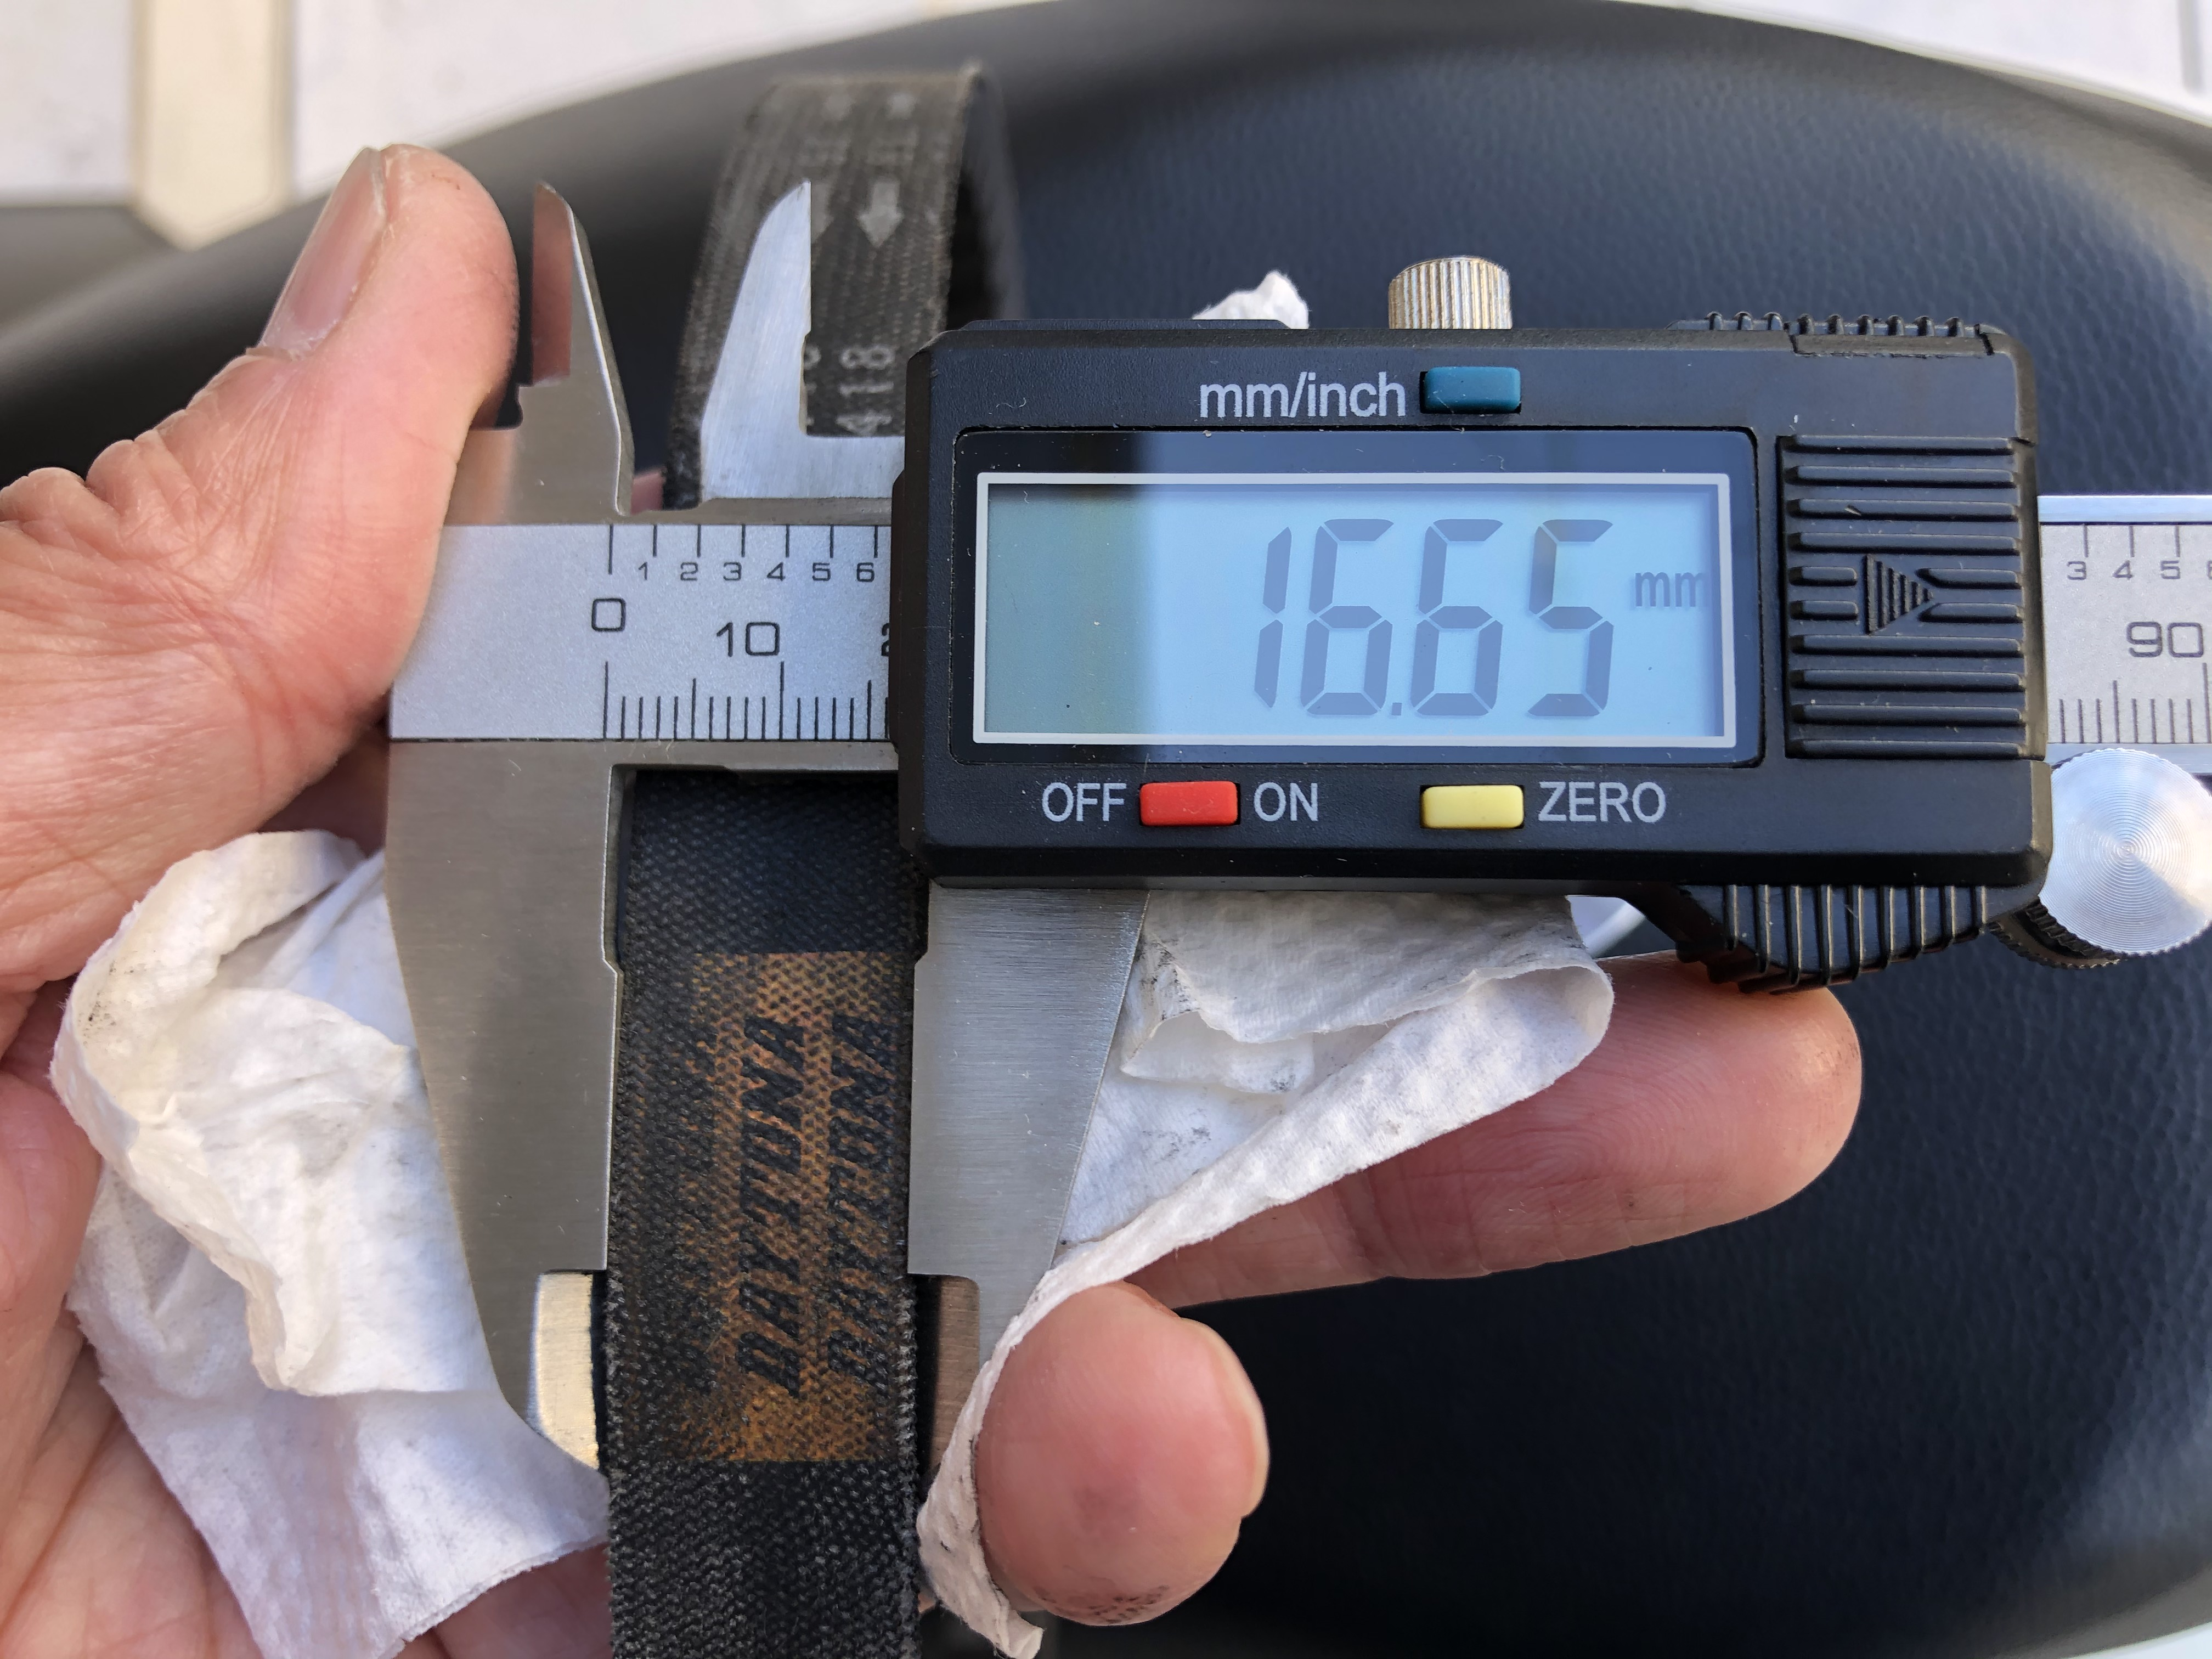 DAYTONA(デイトナ) 強化Vベルト ライブDIO-ZX('94〜'02)、ジャイロキャノピー〈TC50P/V※TA02-110、TA02-130のみ適合〉 95418